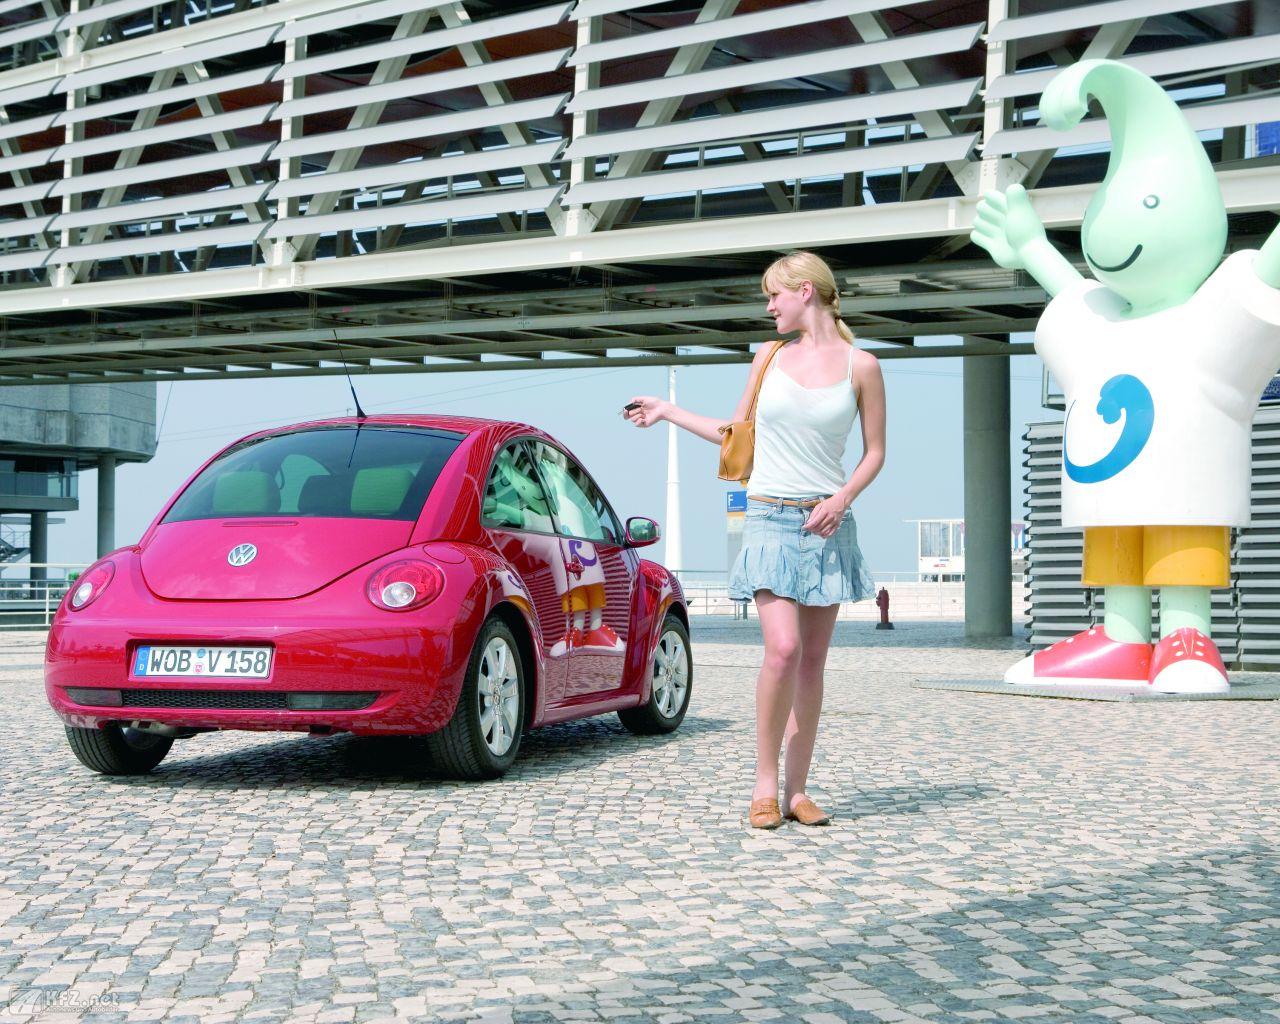 vw-beetle-1280x1024-9